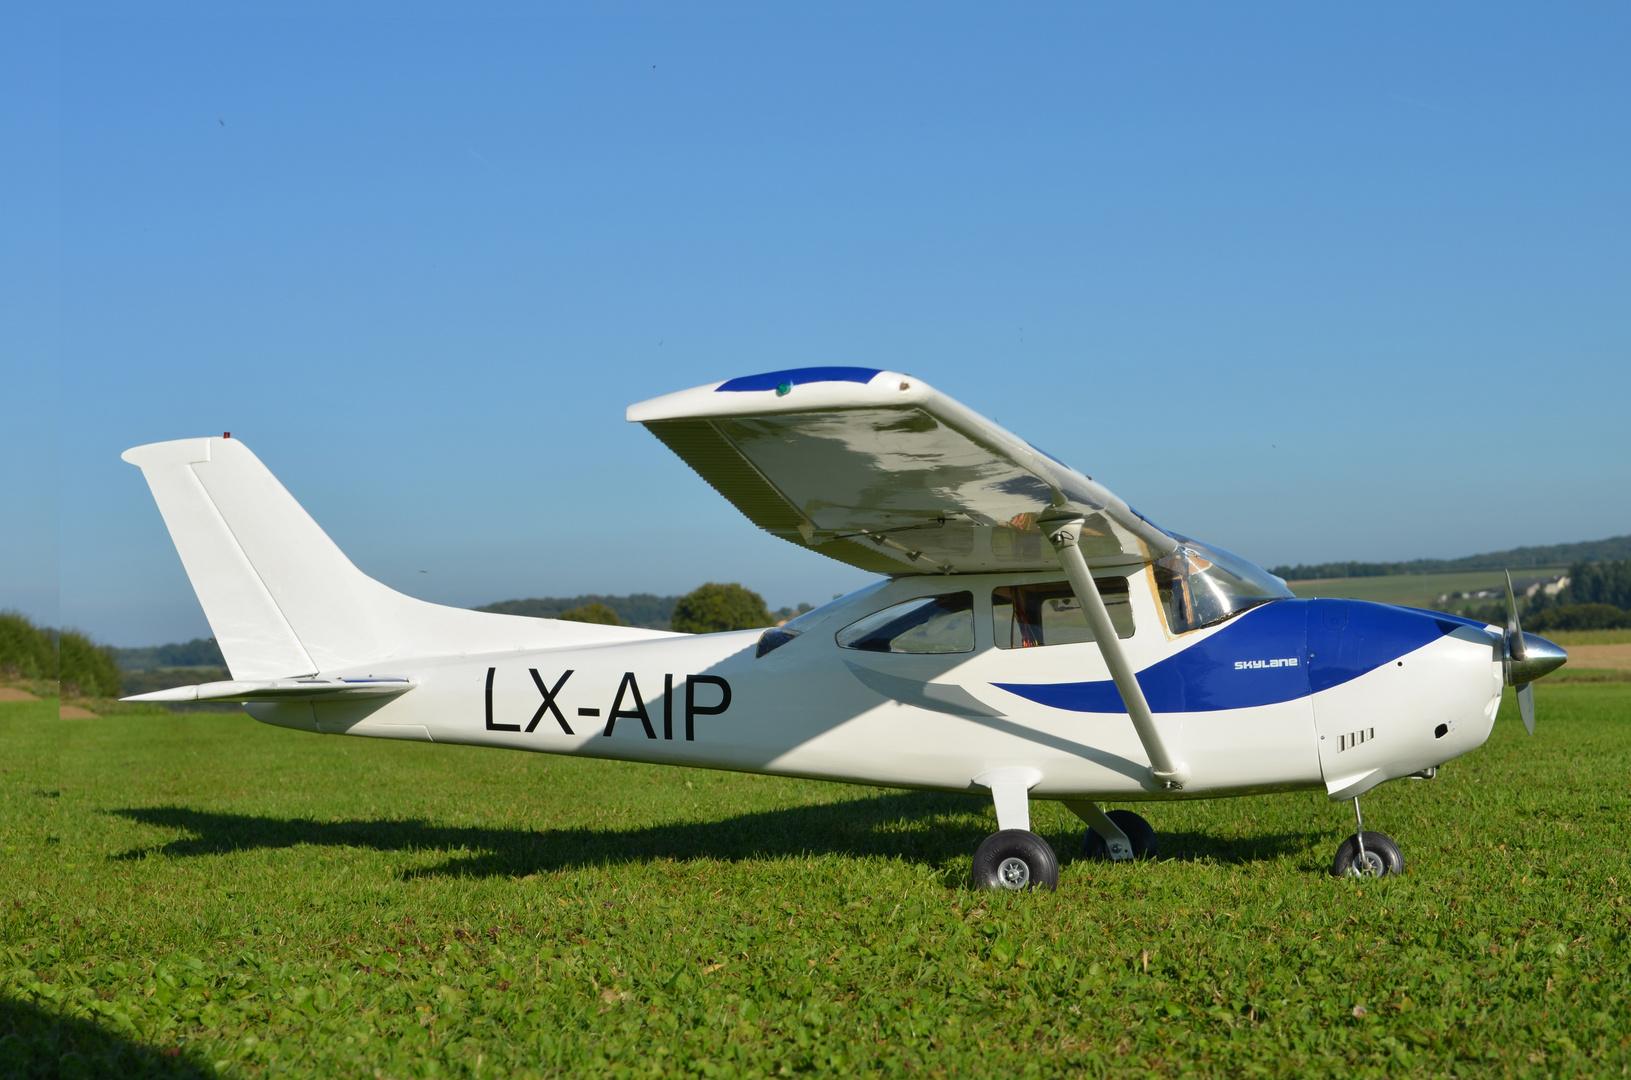 Cessna LX-AIP